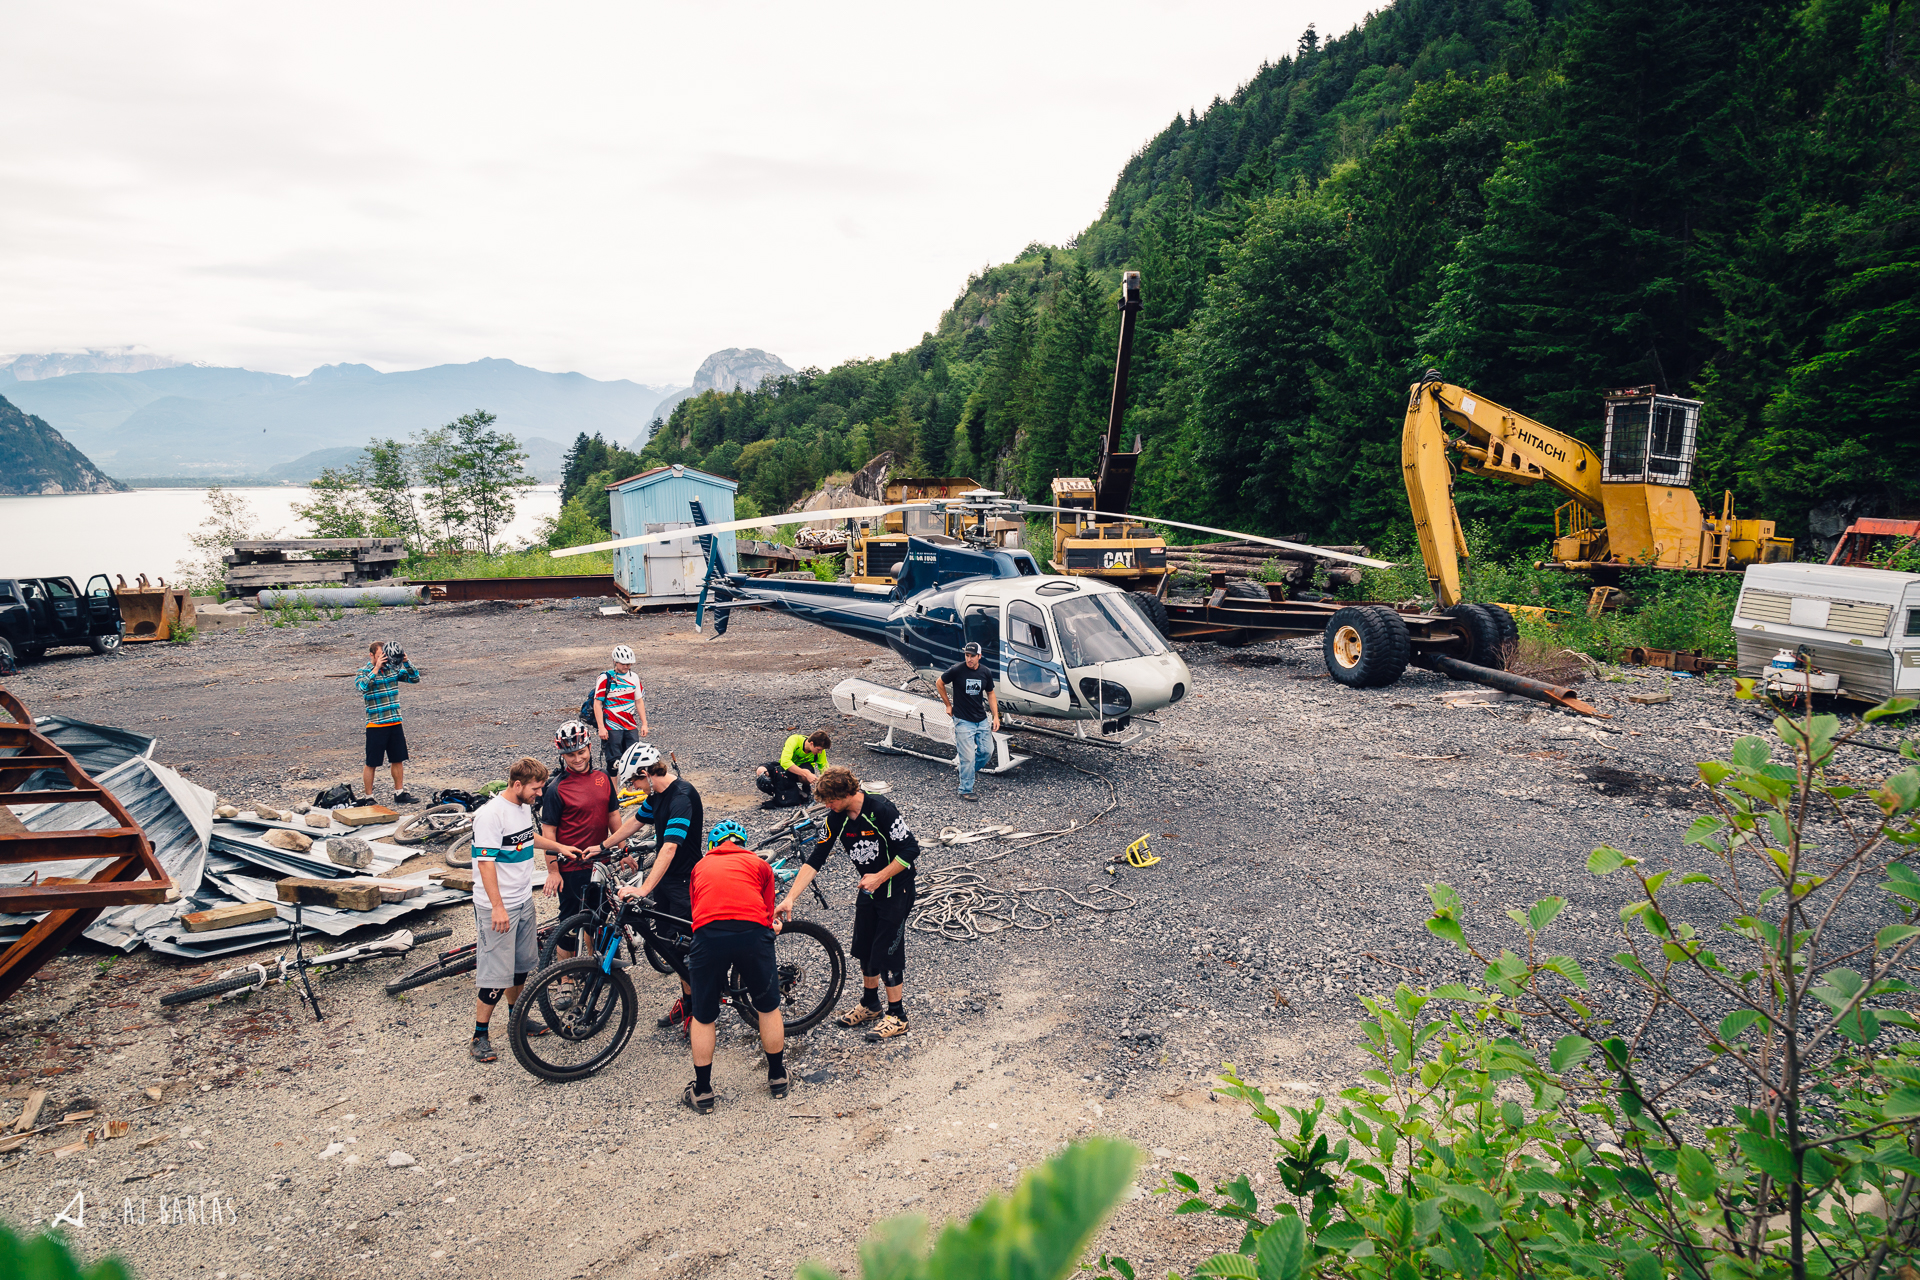 Heli-bike uplift prep